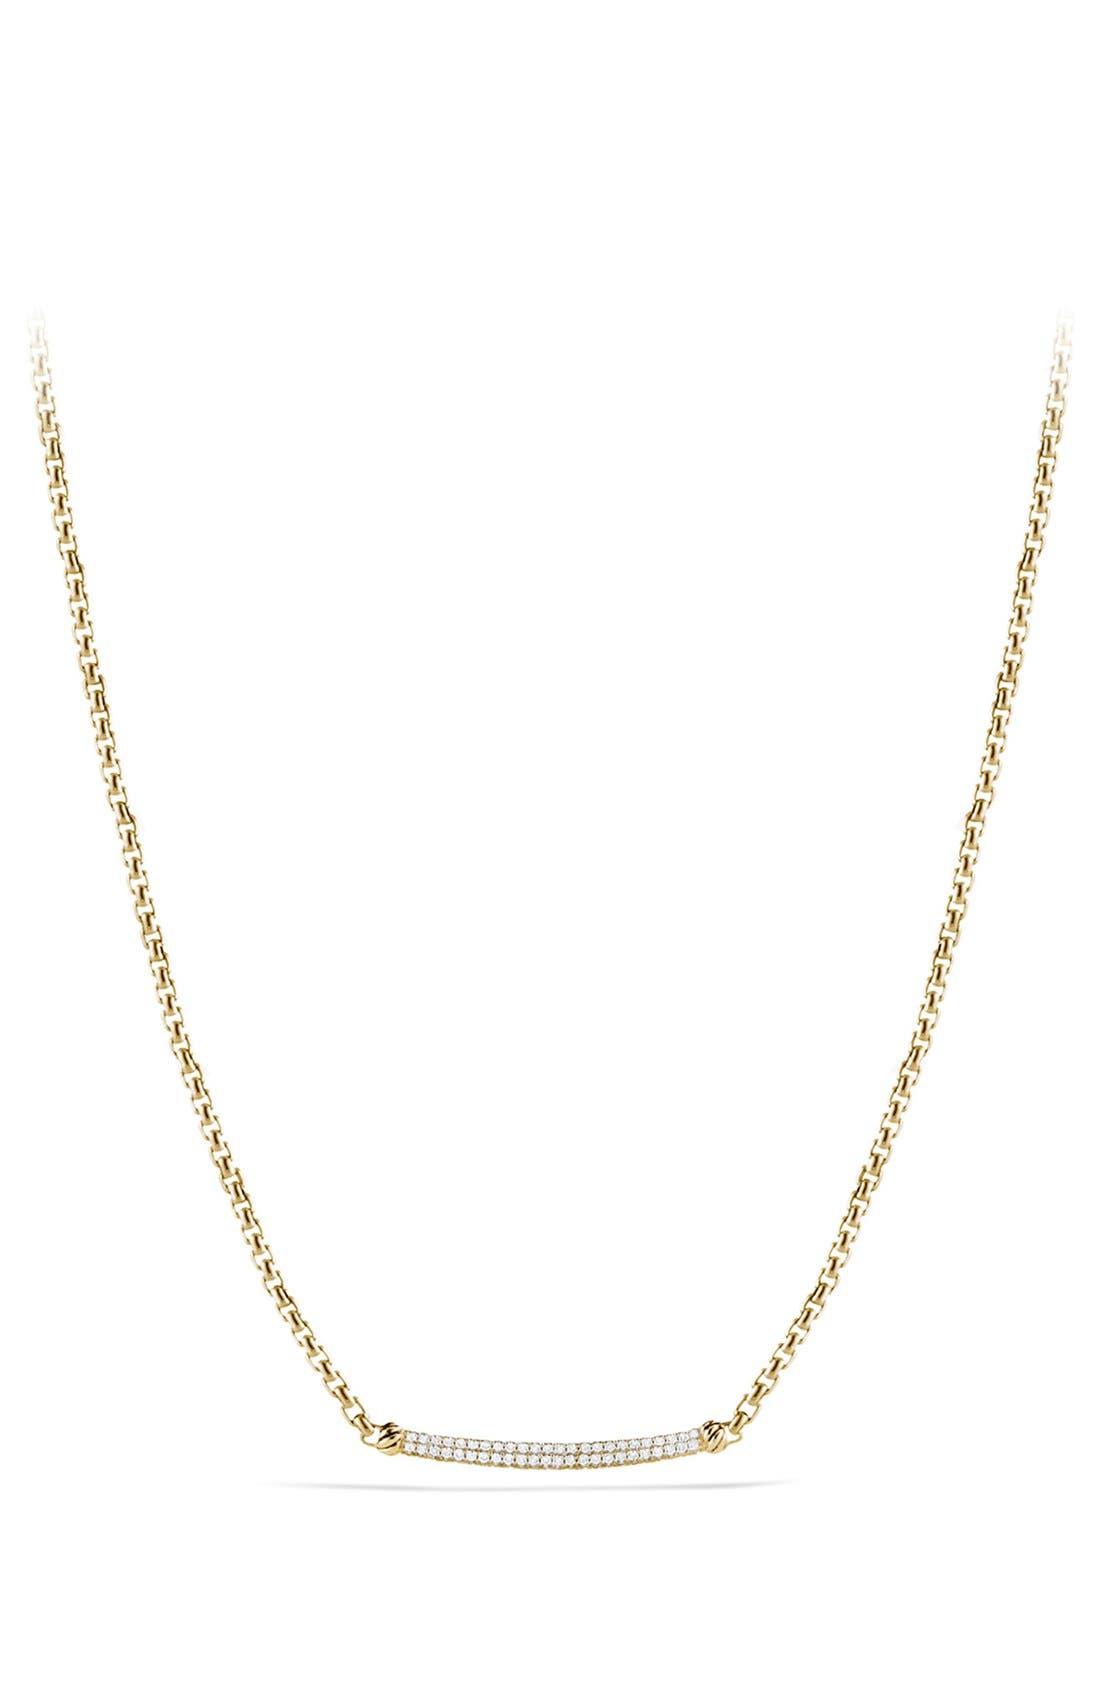 Alternate Image 1 Selected - David Yurman 'Petite Pavé' Metro Chain Necklace with Diamonds in Gold